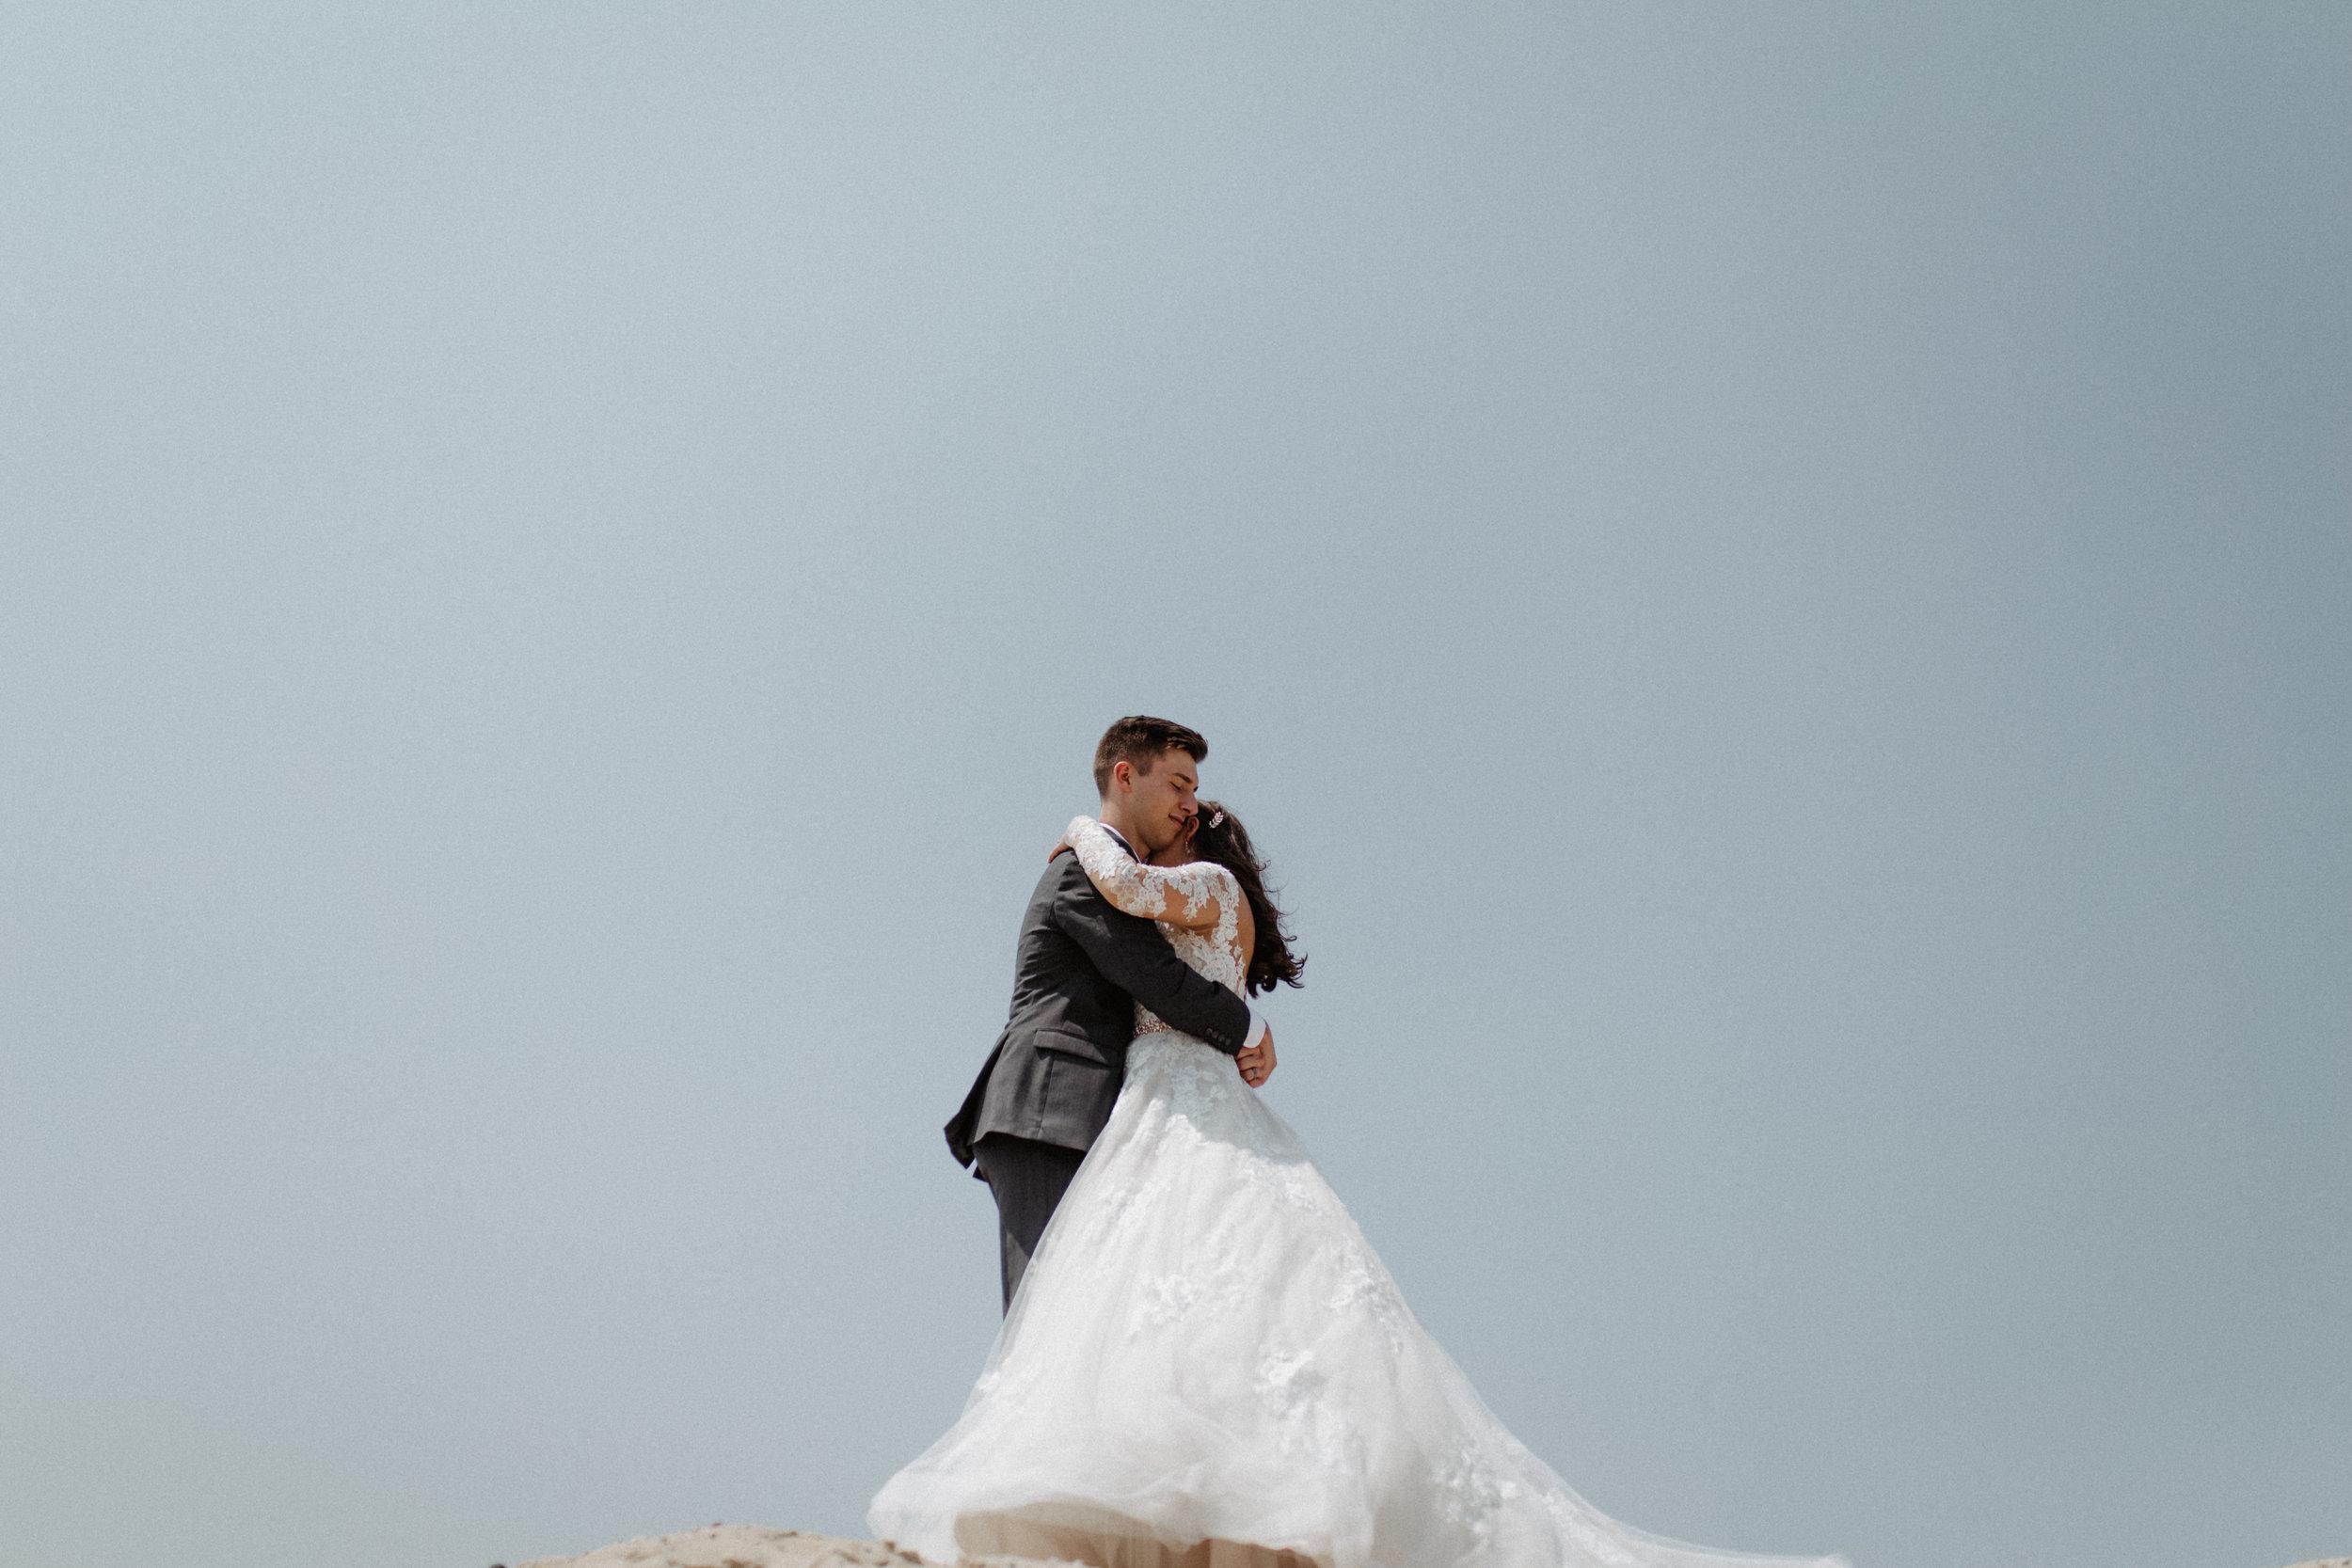 GRAYCENTOMHAMILTON-GRAND-RAPIDS-WEDDING-PHOTOGRAPHY-29.jpg